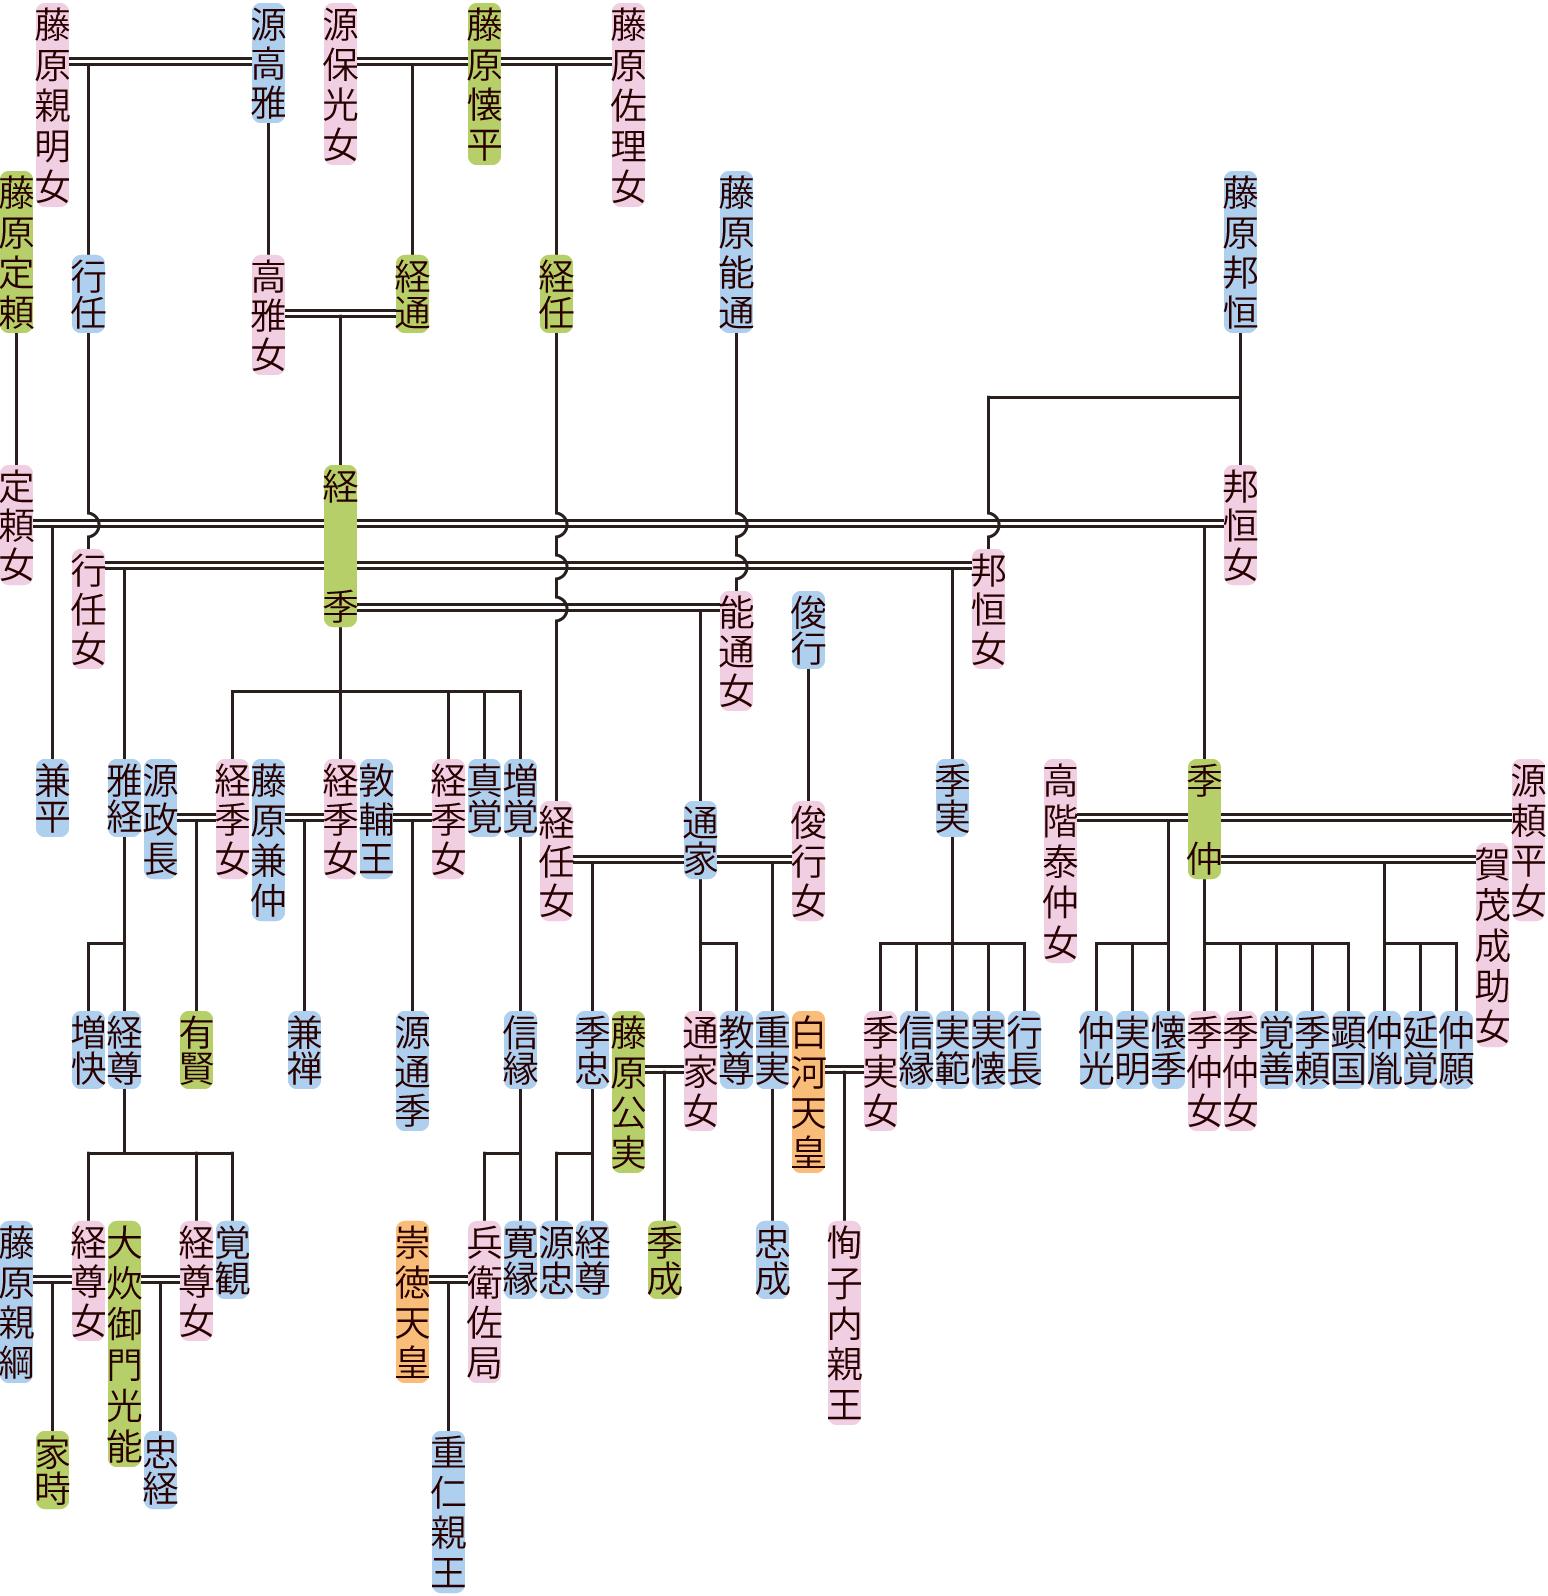 藤原経季の系図